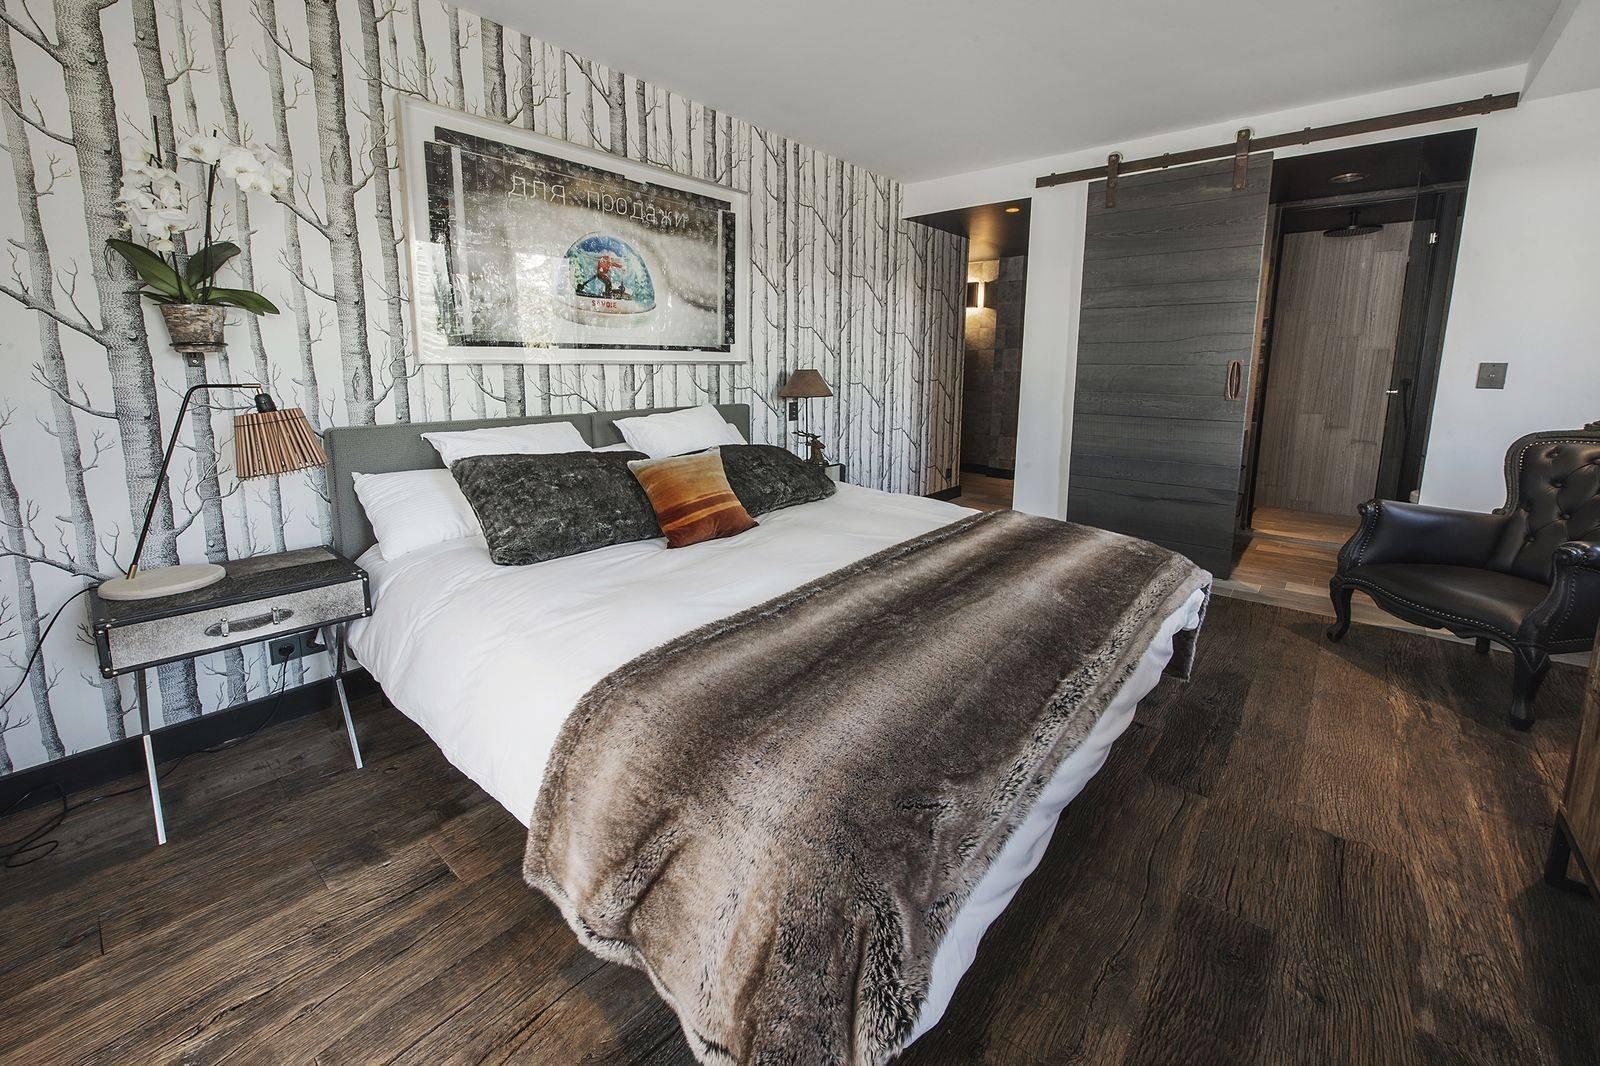 Courchevel 1550 Luxury Rental Chalet Niibite Bedroom 2